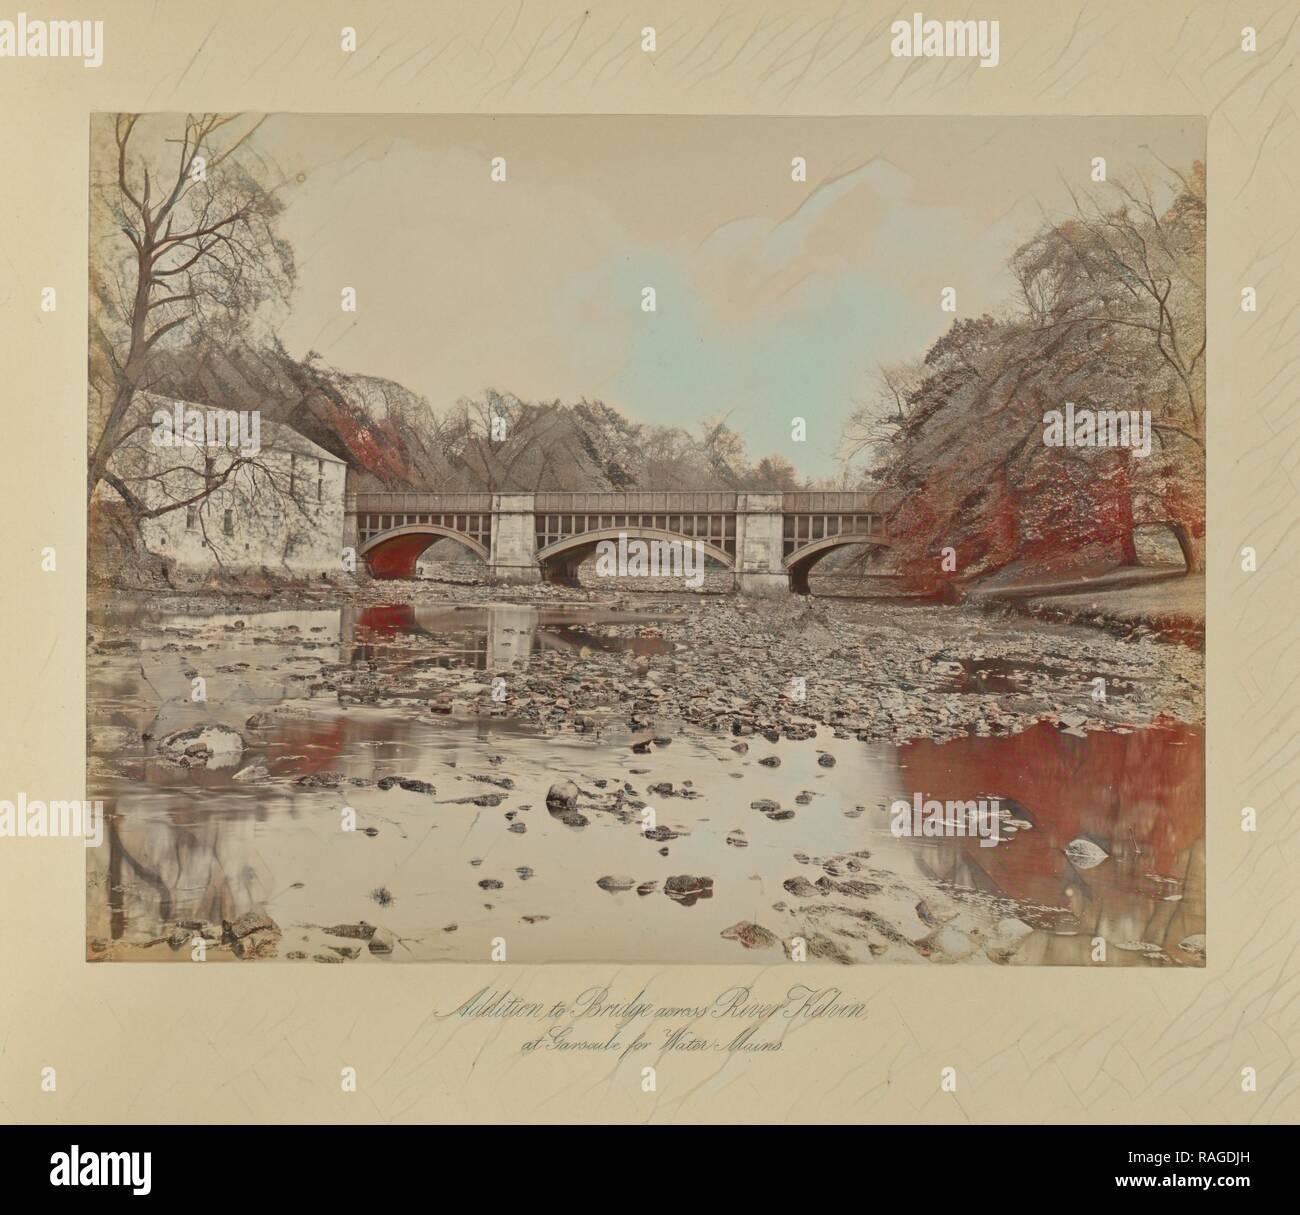 Addition to Bridge across River Kelvin, Thomas Annan (Scottish,1829 - 1887), Glasgow, Scotland, 1877, Albumen silver reimagined - Stock Image